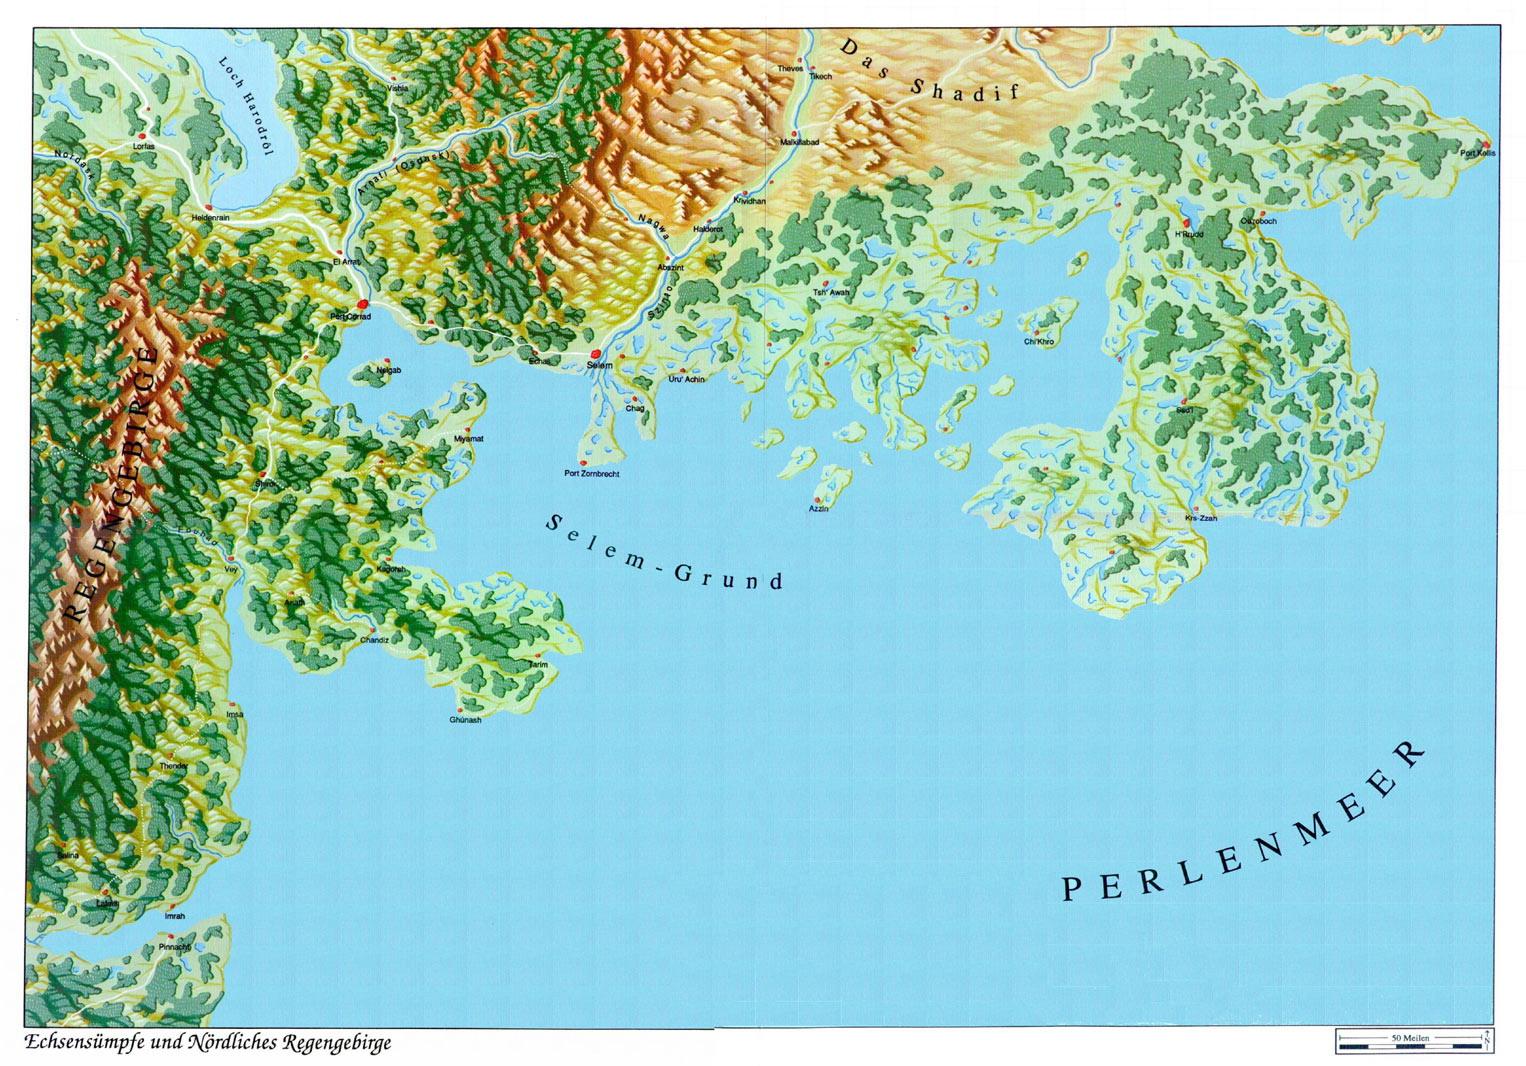 Dsa Karte Bornland.Karten